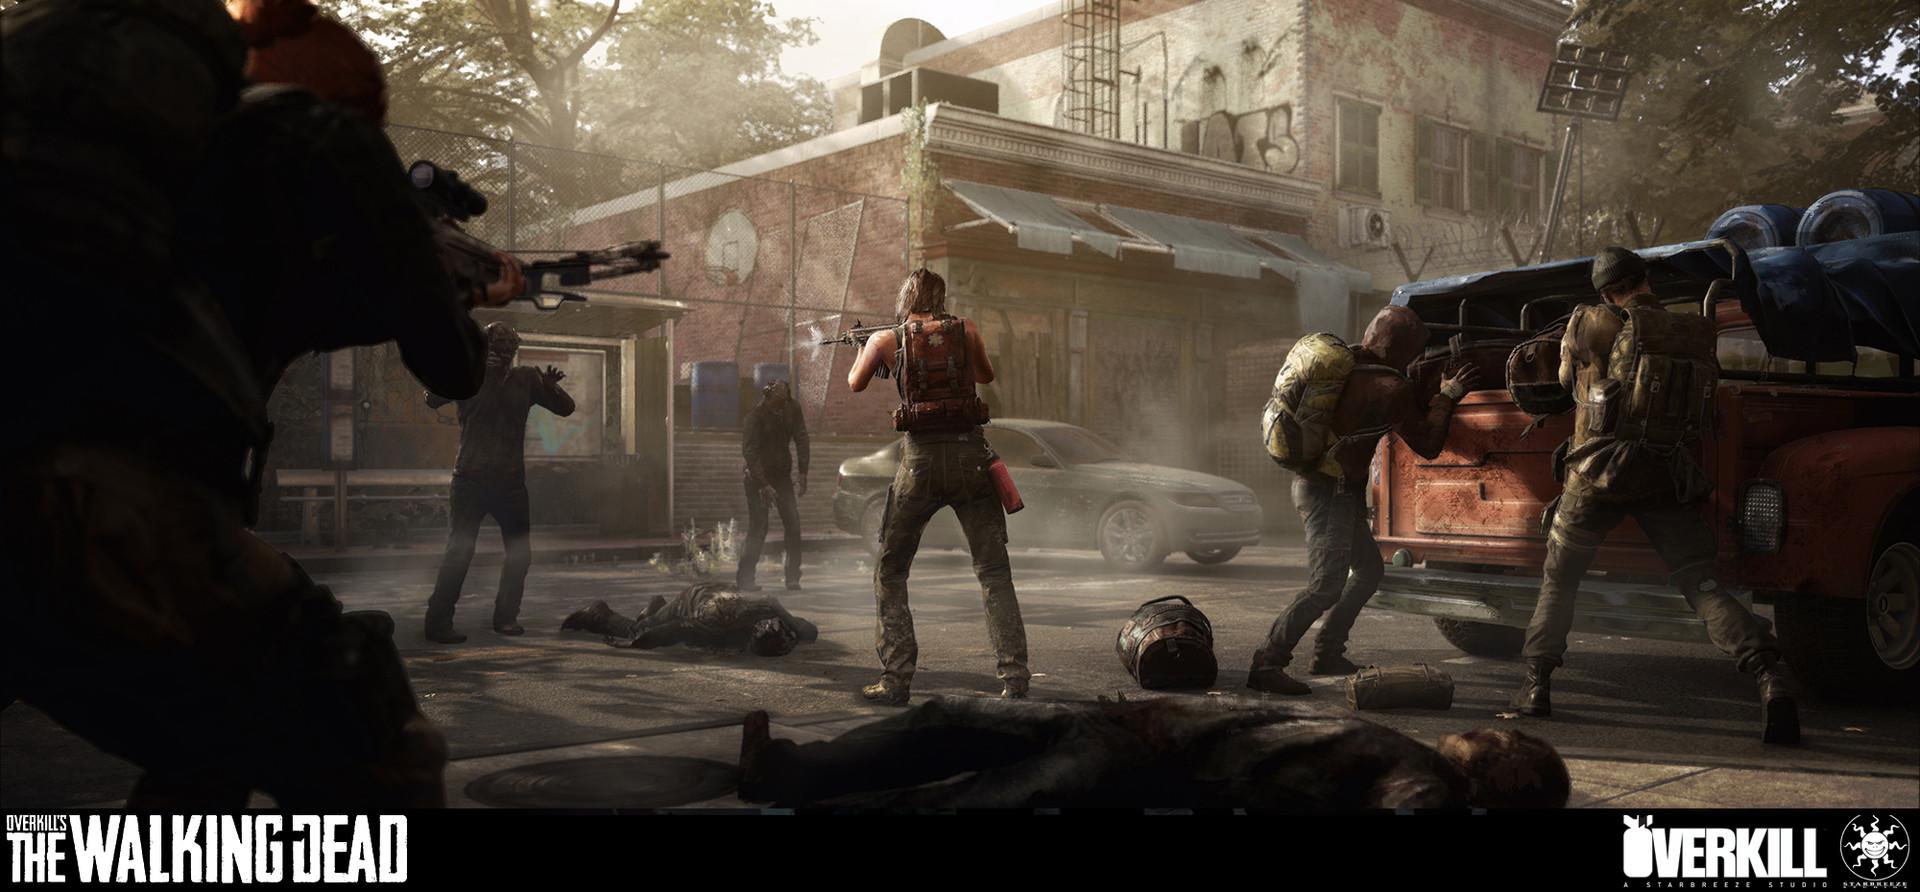 The Walking Dead Game Concept Art - The Walking Dead